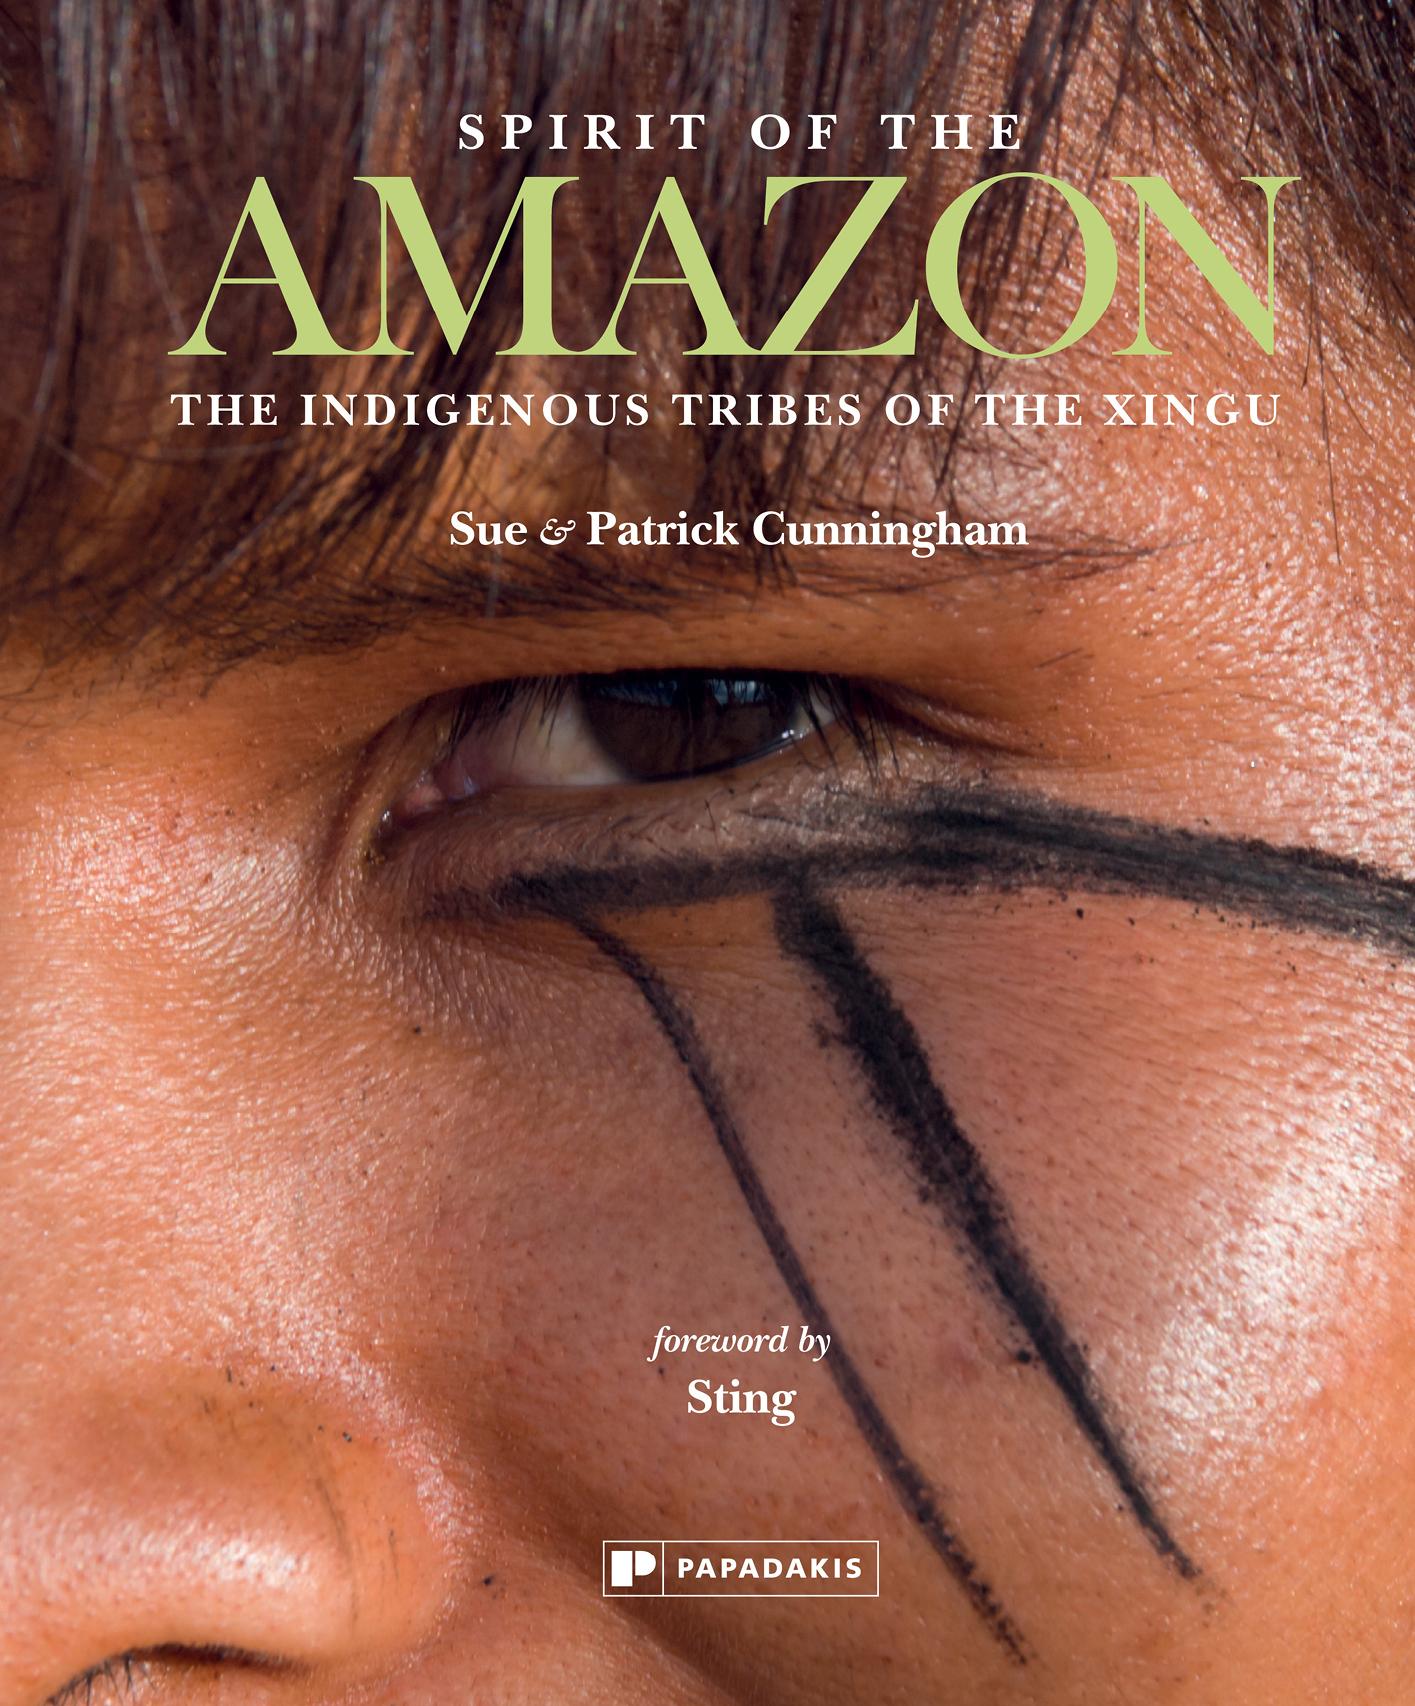 Cunningham's book Spirit of the Amazon